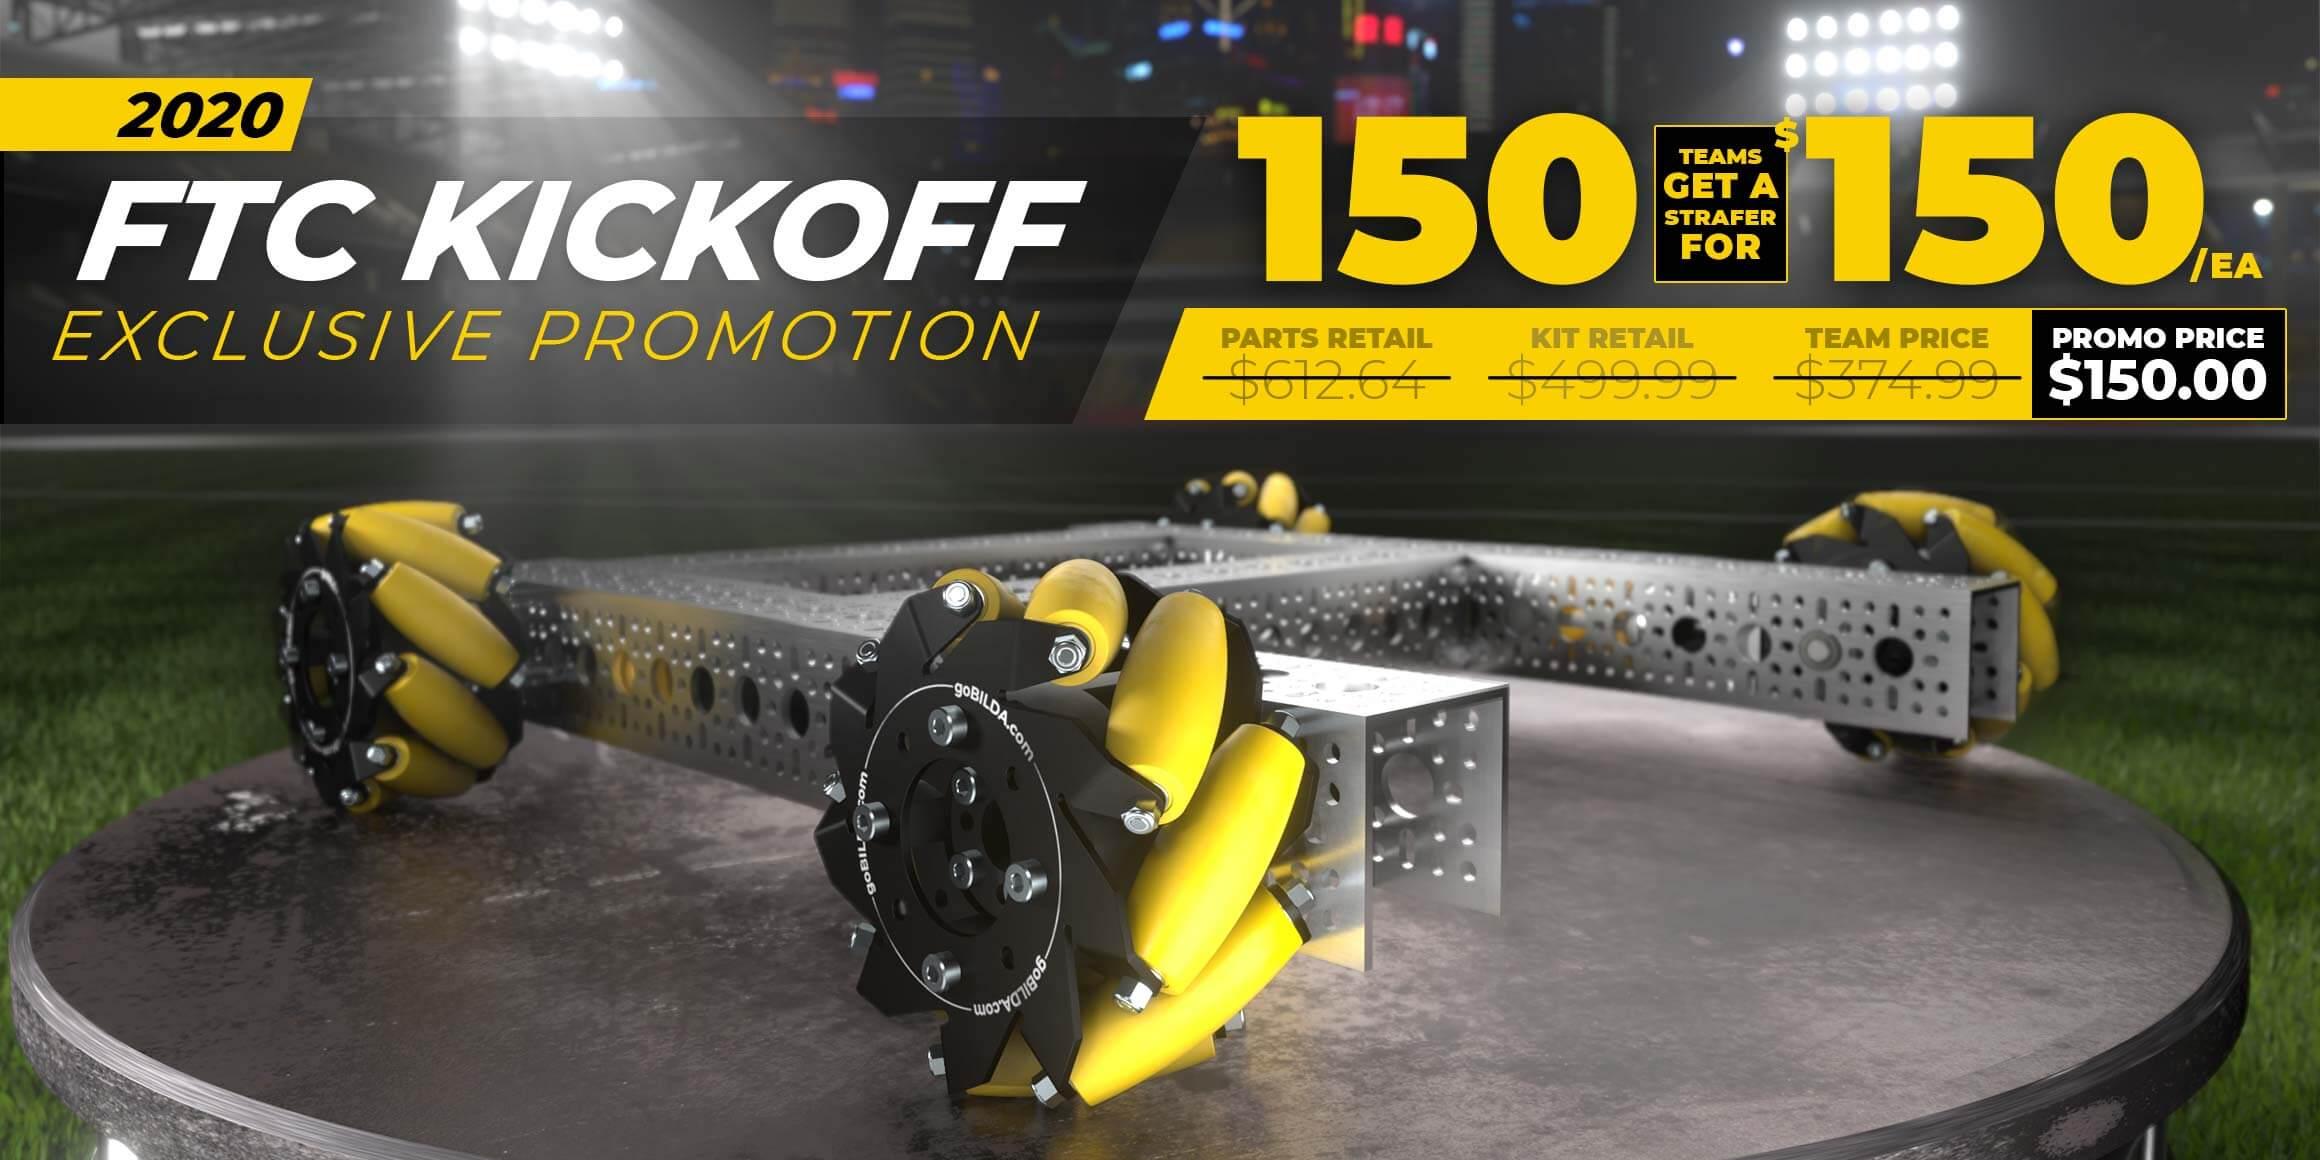 ftc-kickoff-2020-carousel-v2.jpg